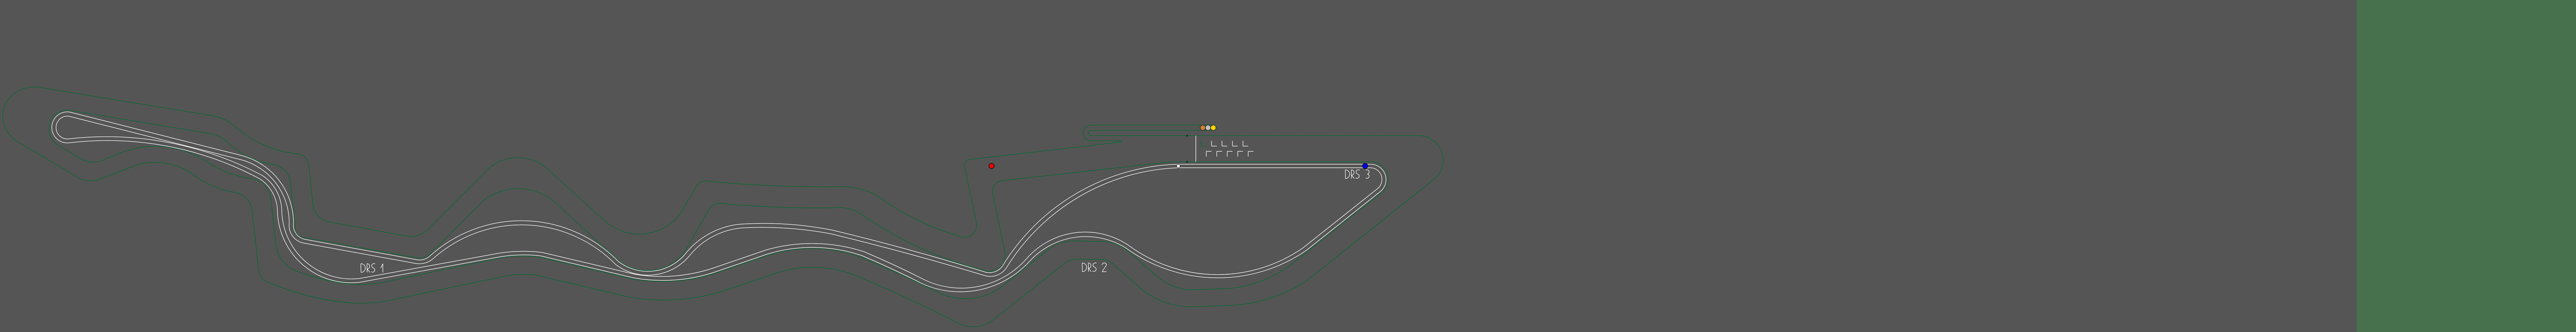 hax ball maps   Jeddah Street Circuit by NR6